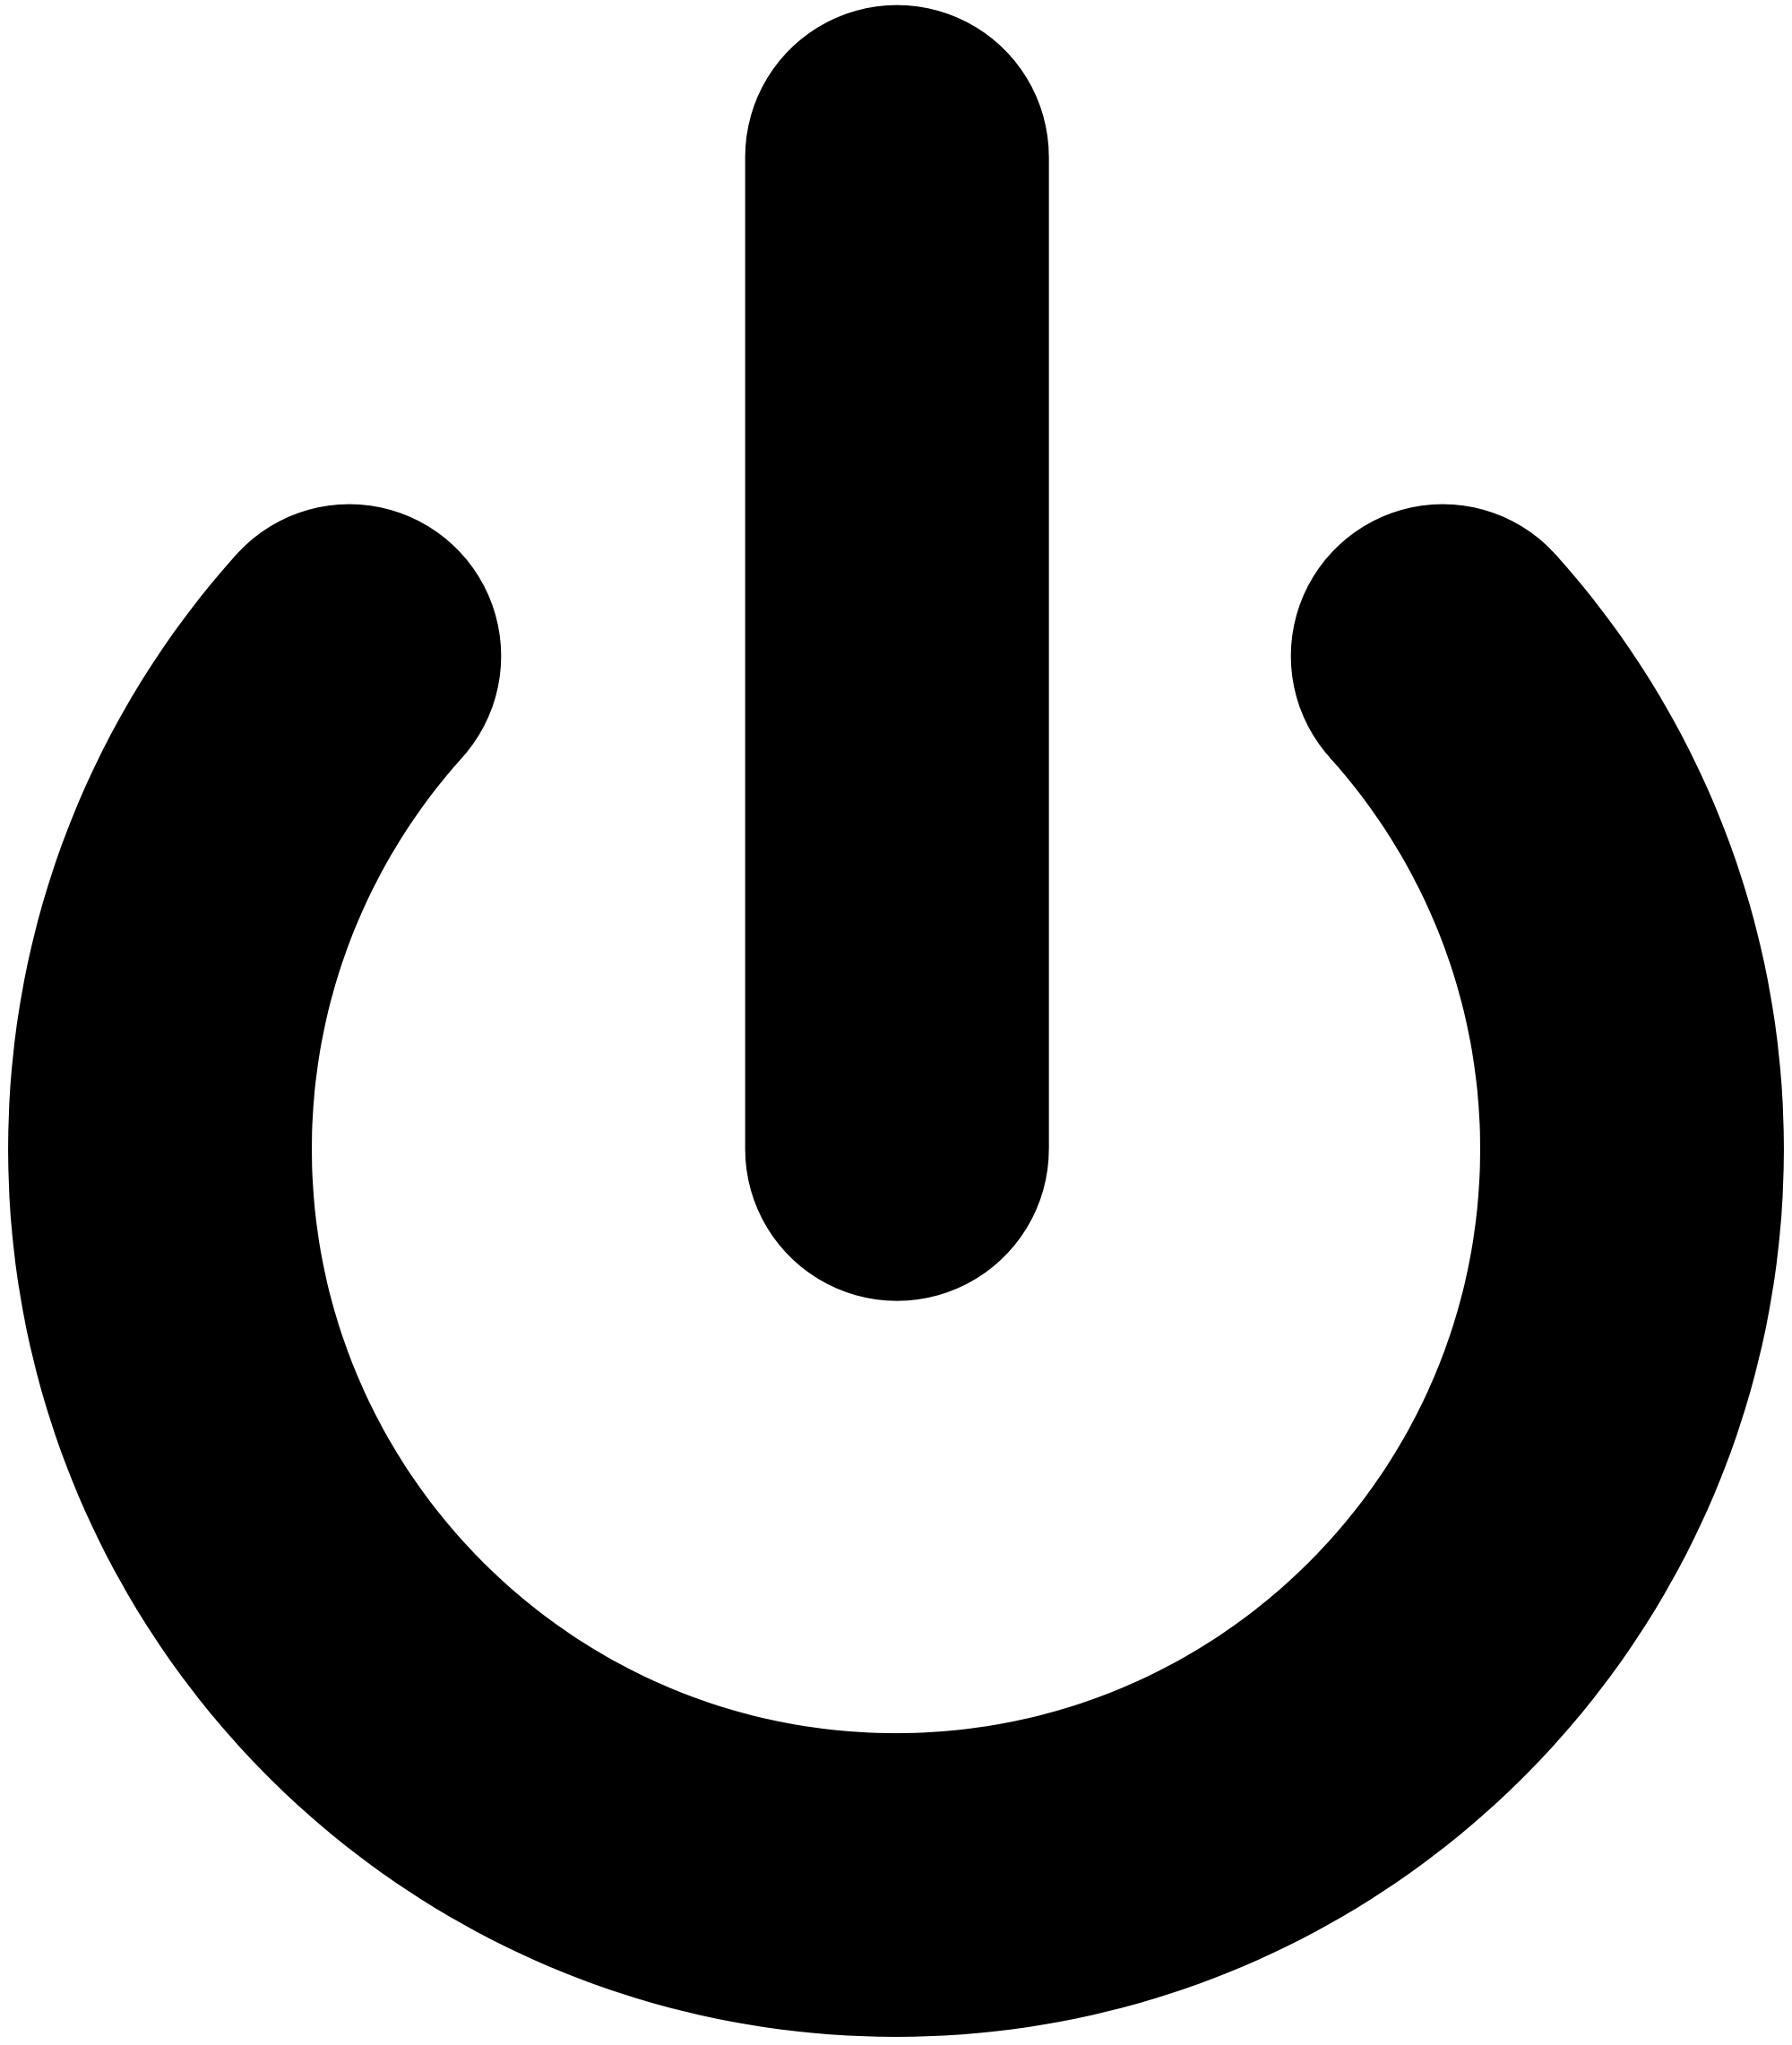 Words clipart electricity. Power symbol emoji image